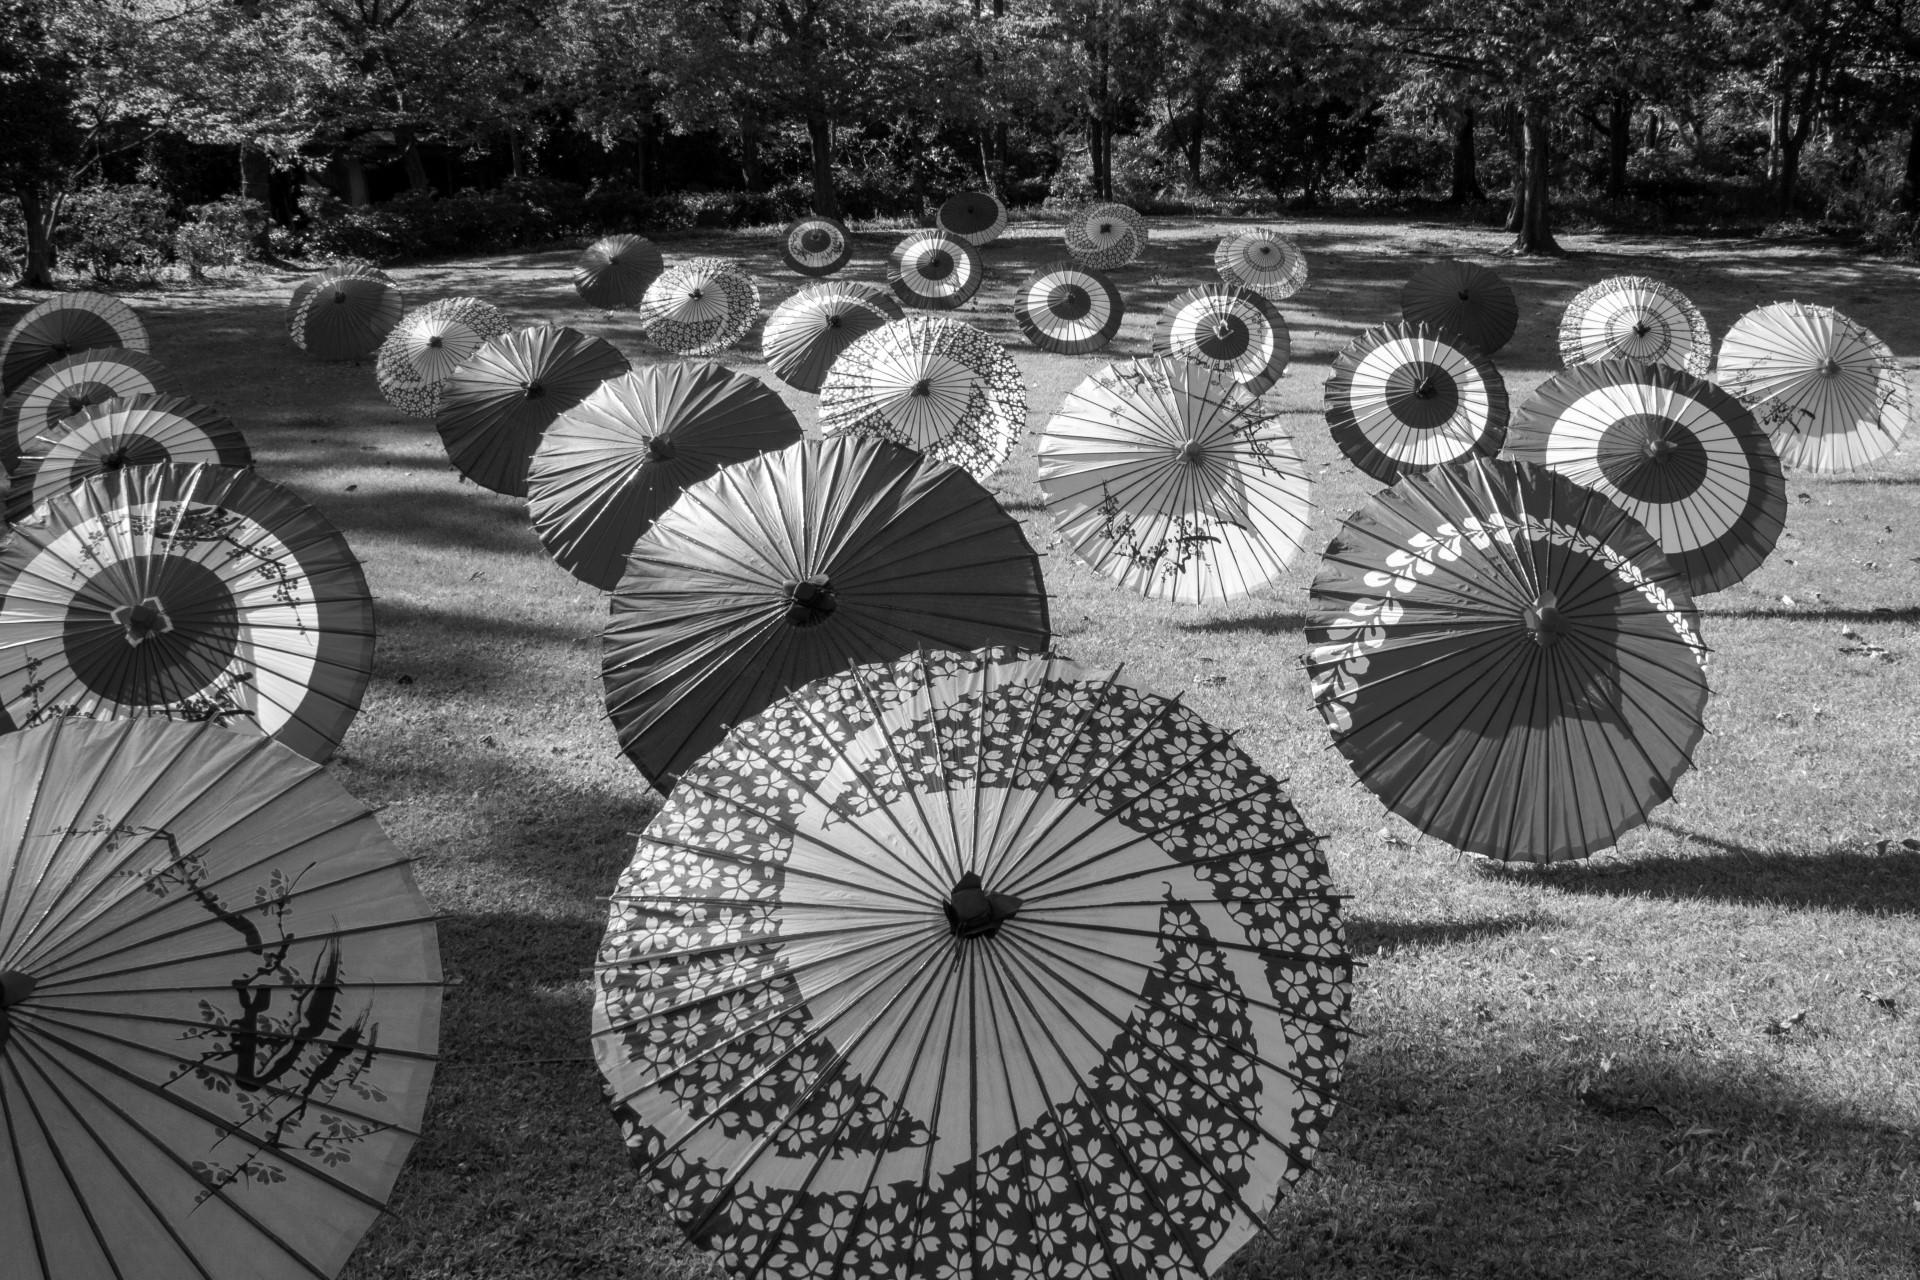 Wagasa, ombrello artigianale giapponese